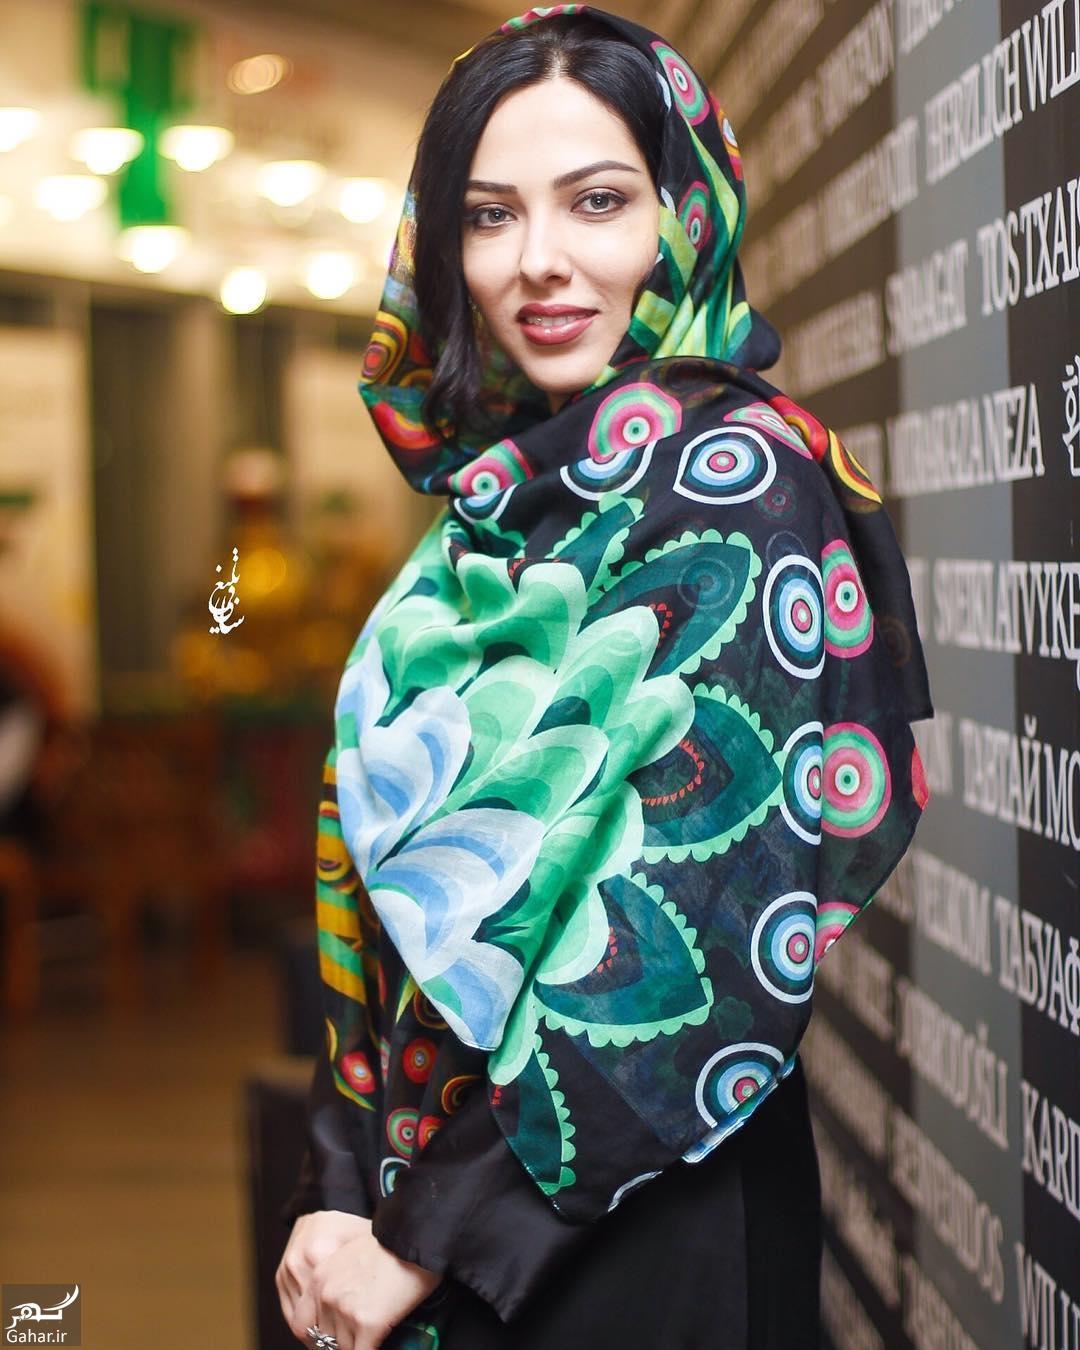 304254 Gahar ir عکس/ تیپ متفاوت لیلا اوتادی در مراسم افتتاحیه فیلم «آشوب»